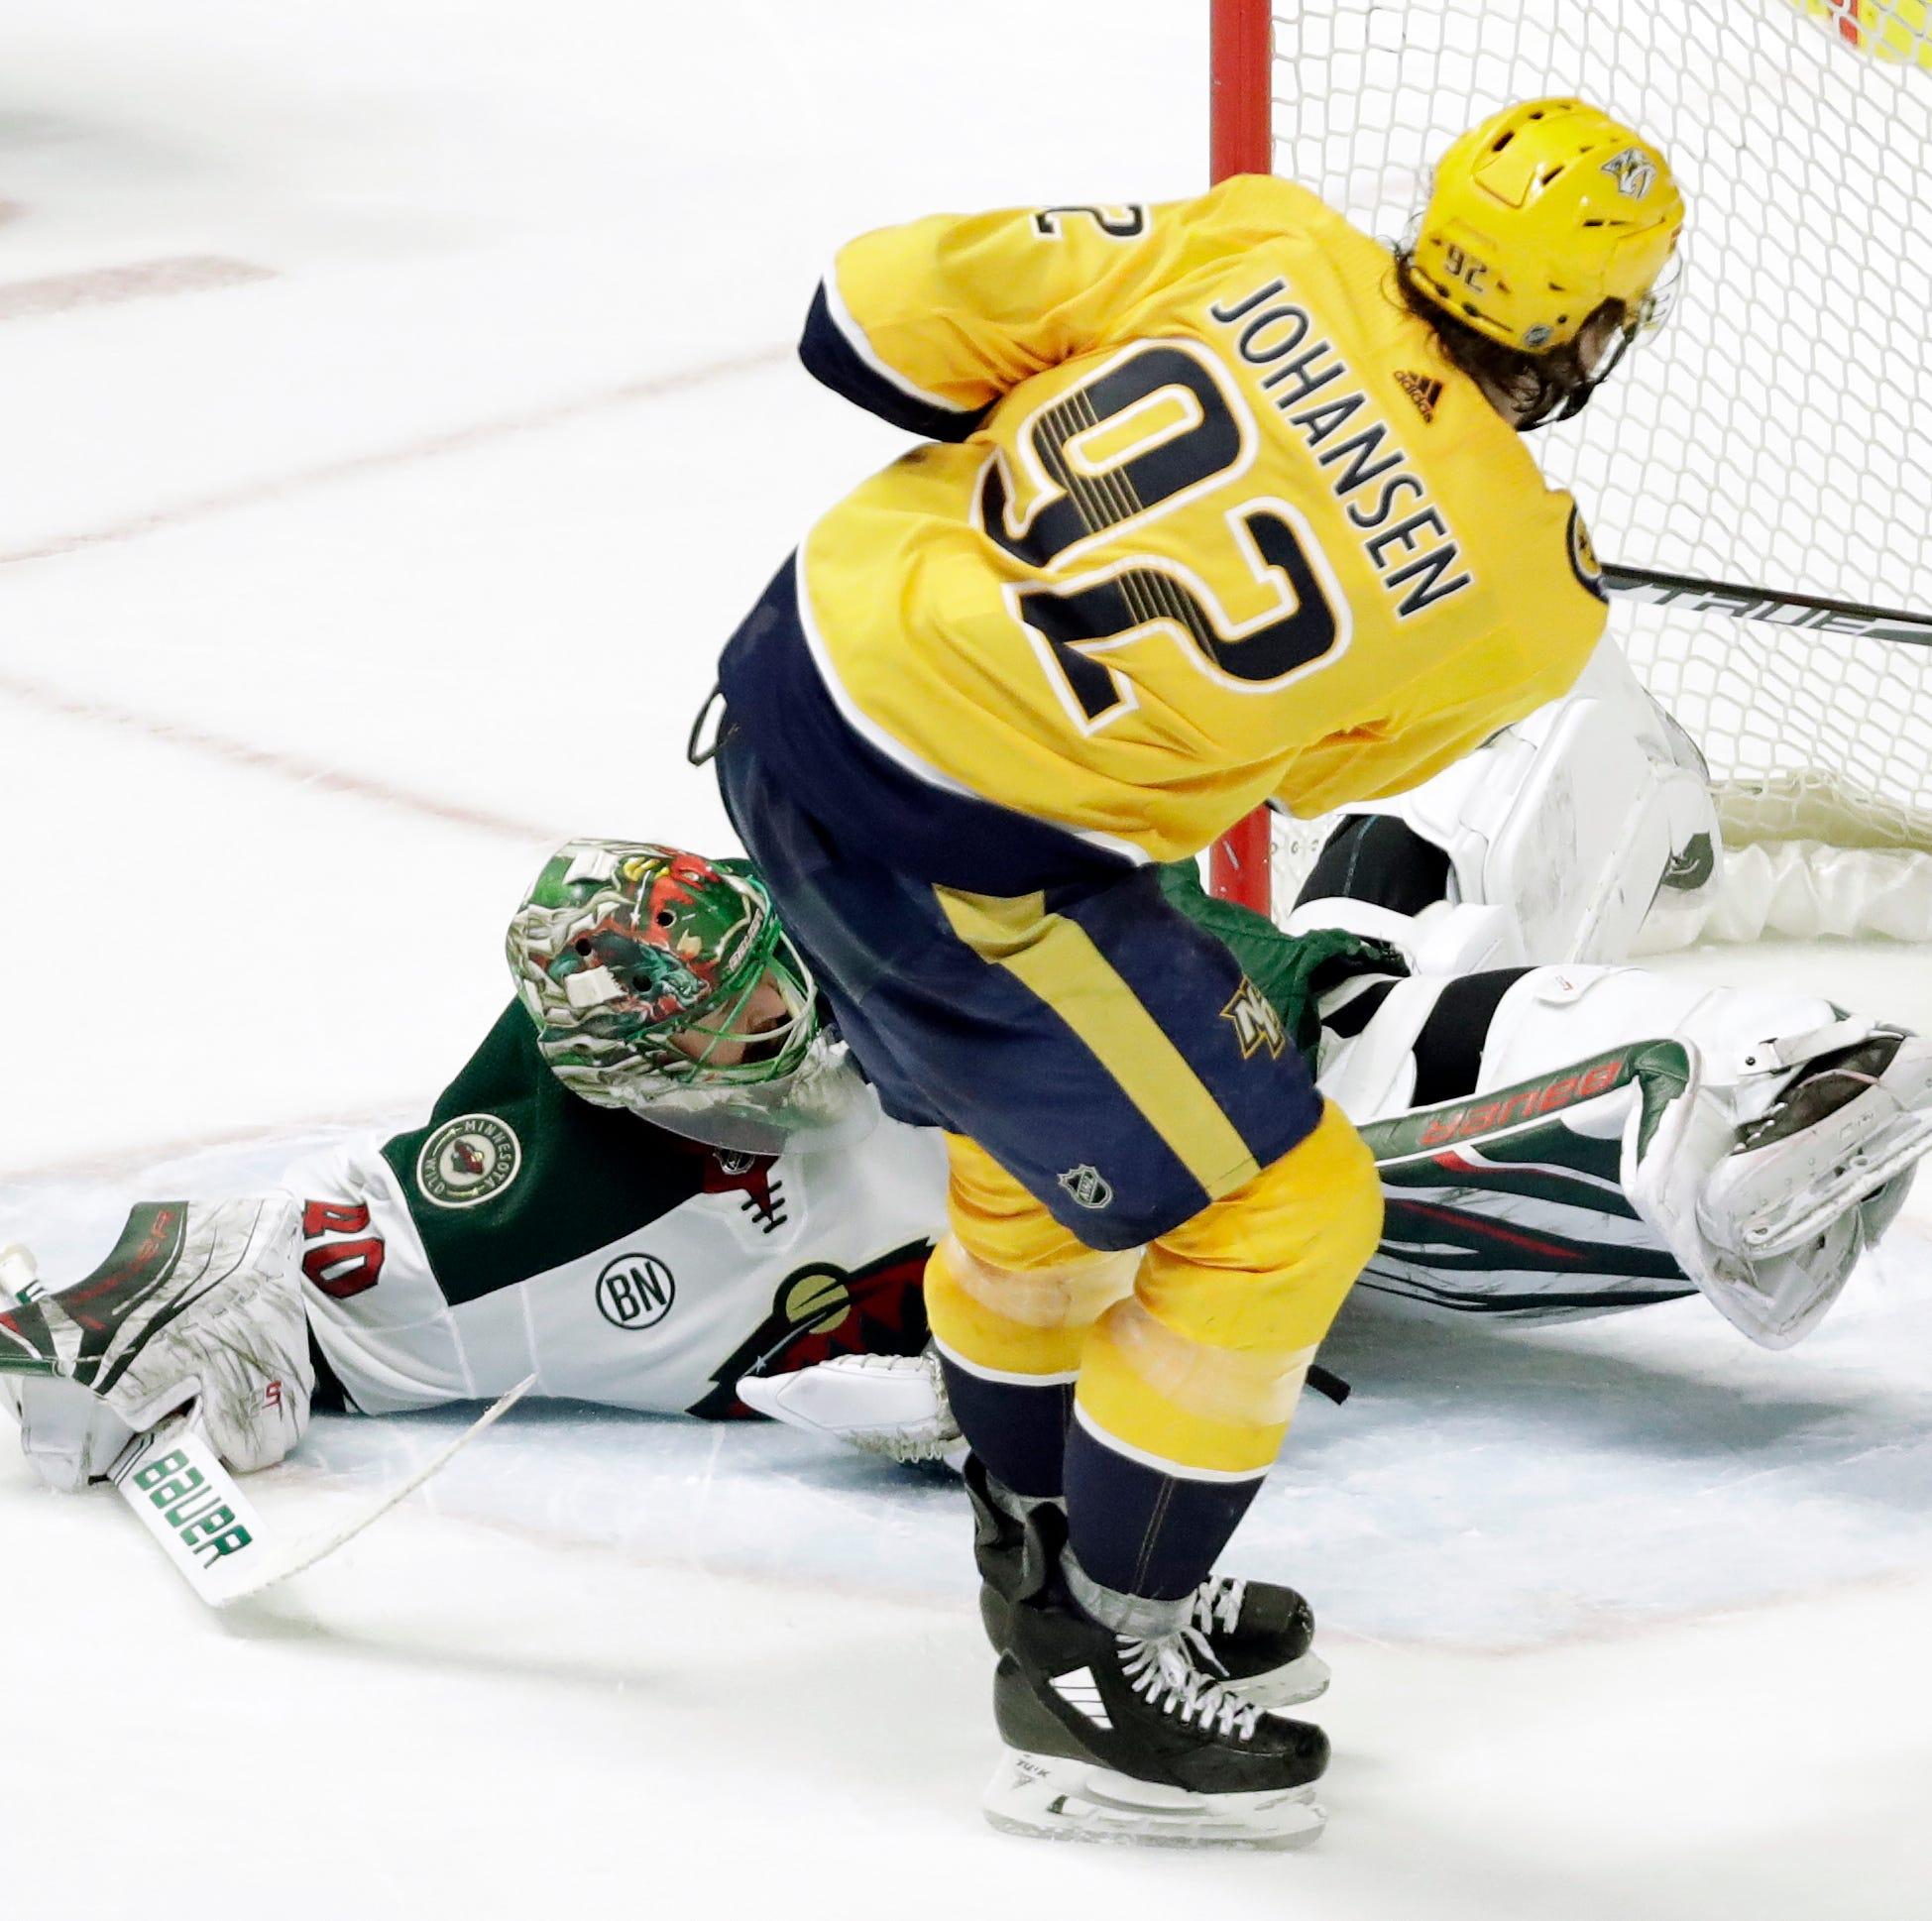 Ryan Johansen does it again: Shootout goal gives Preds win over Wild